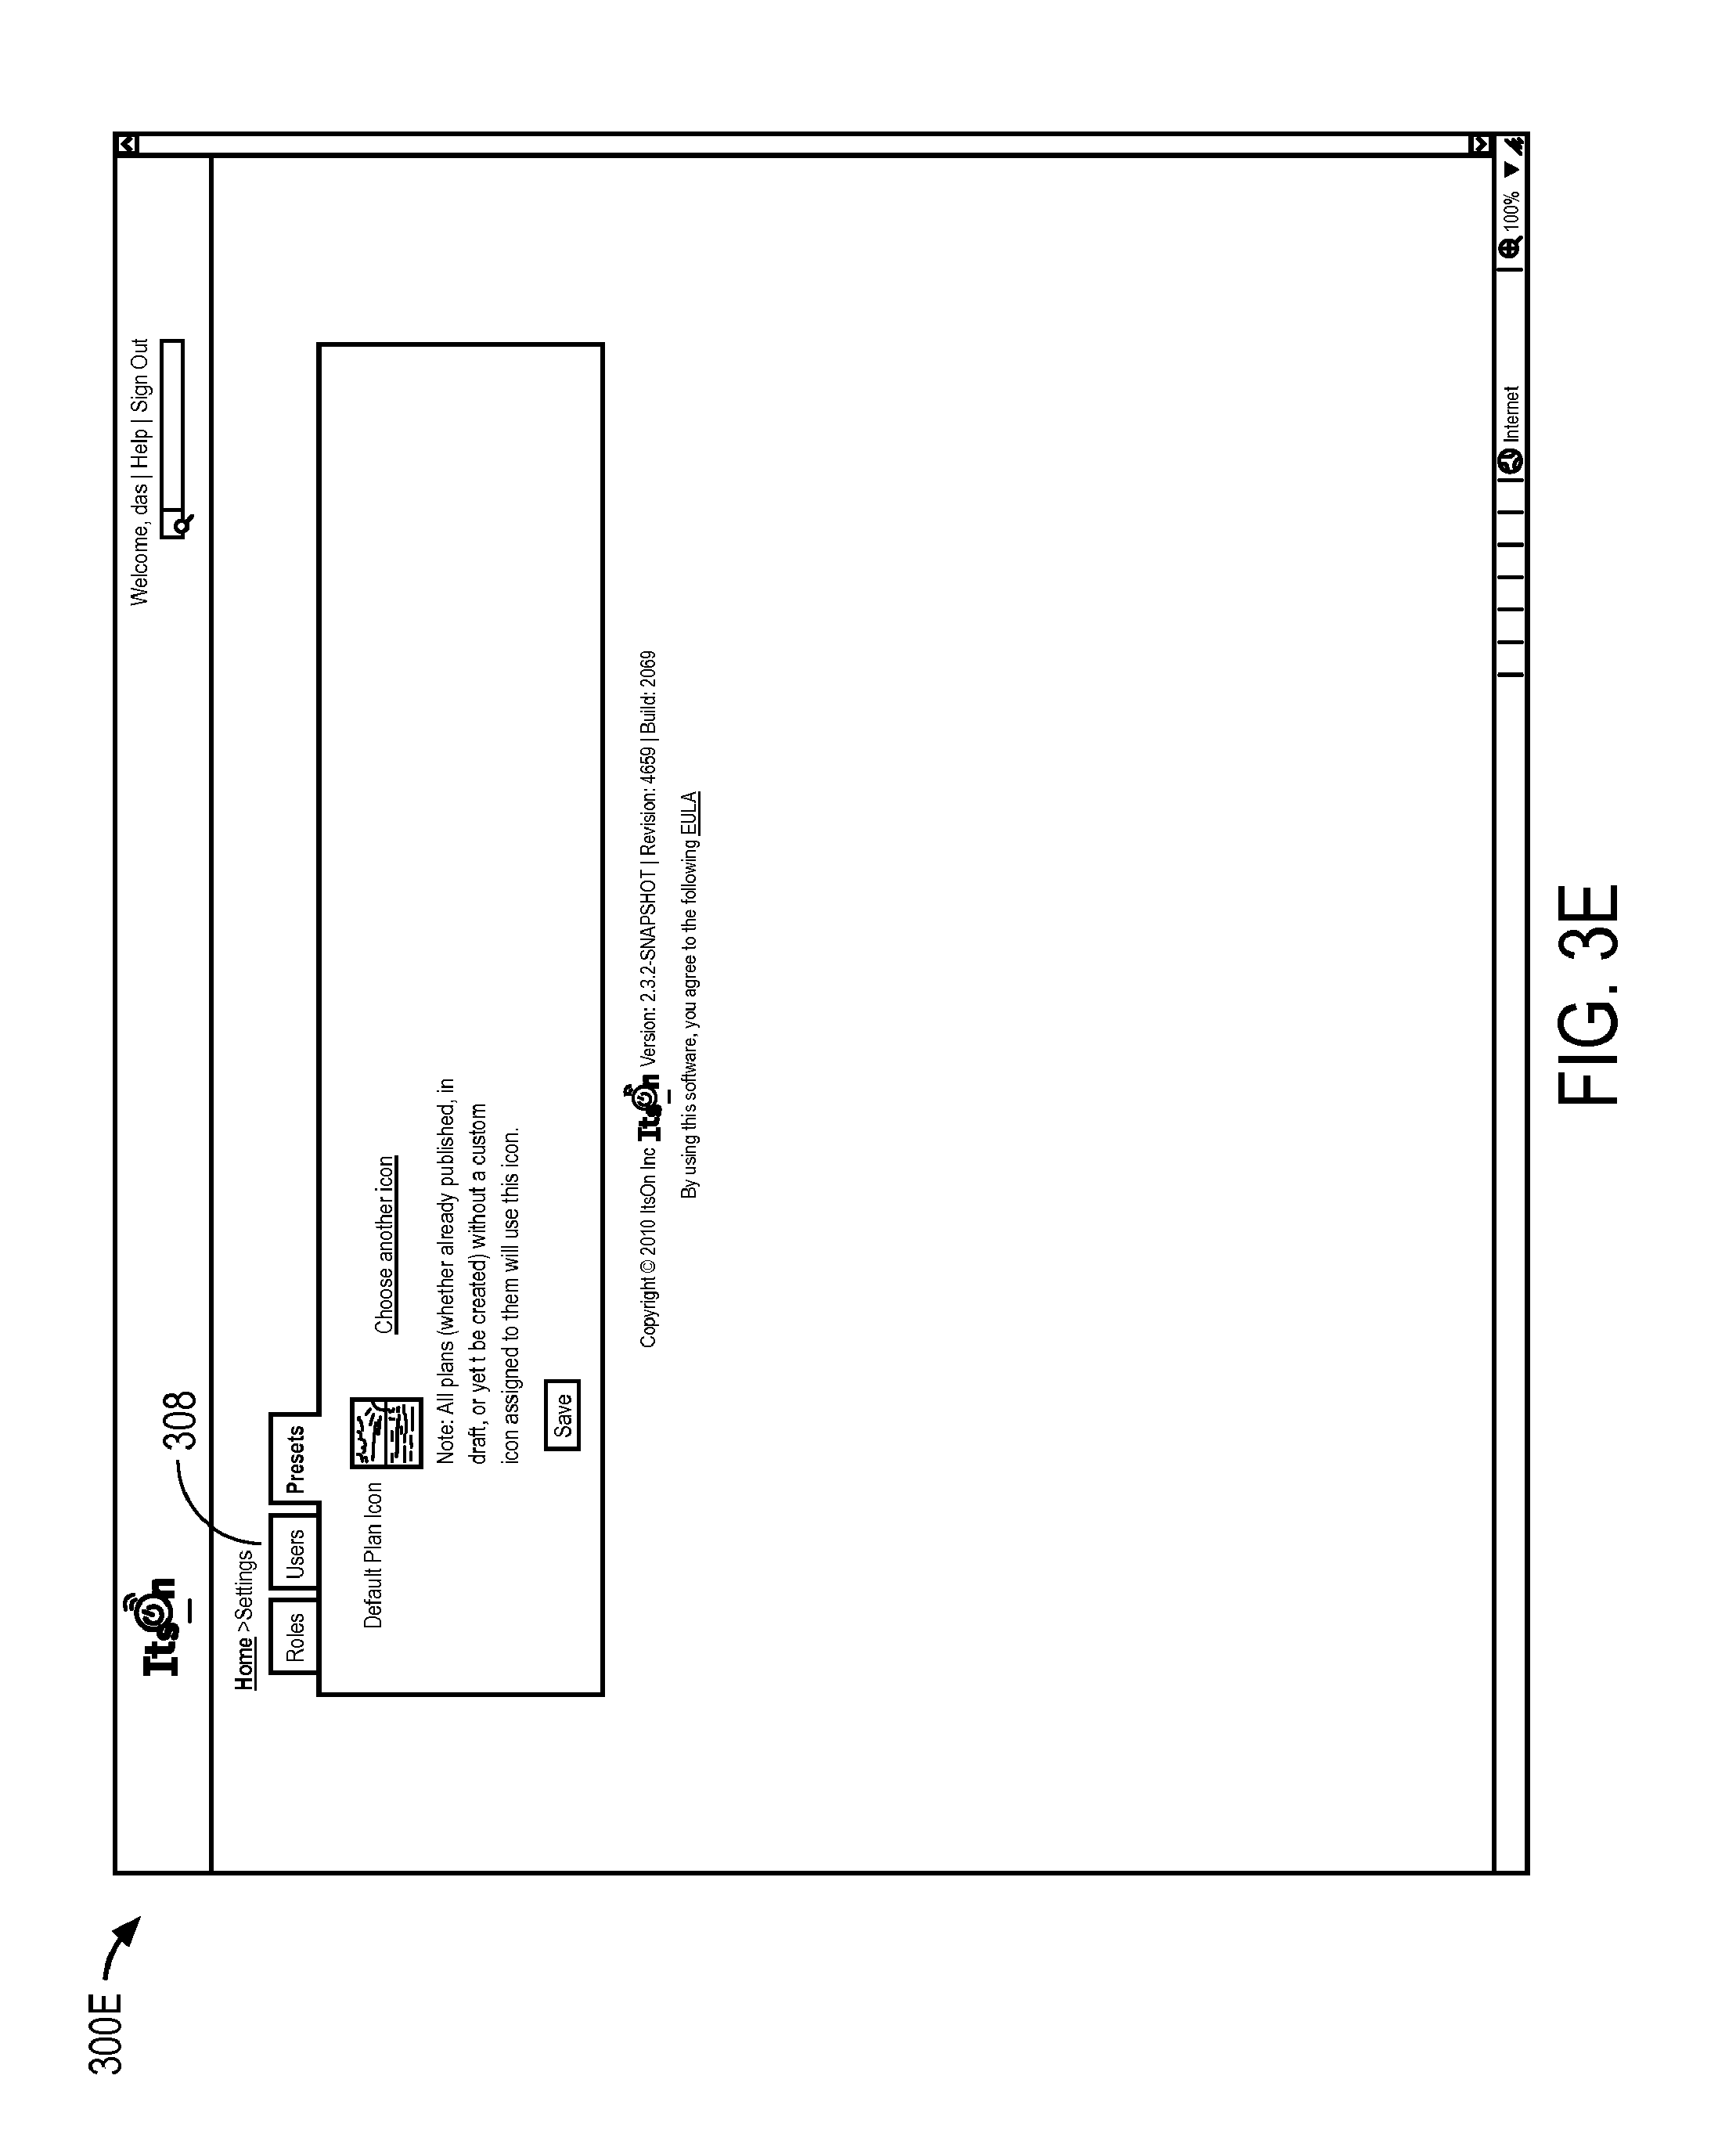 Amplitude Modulator 1 Circuit Diagram Tradeoficcom - Wiring Diagram DB